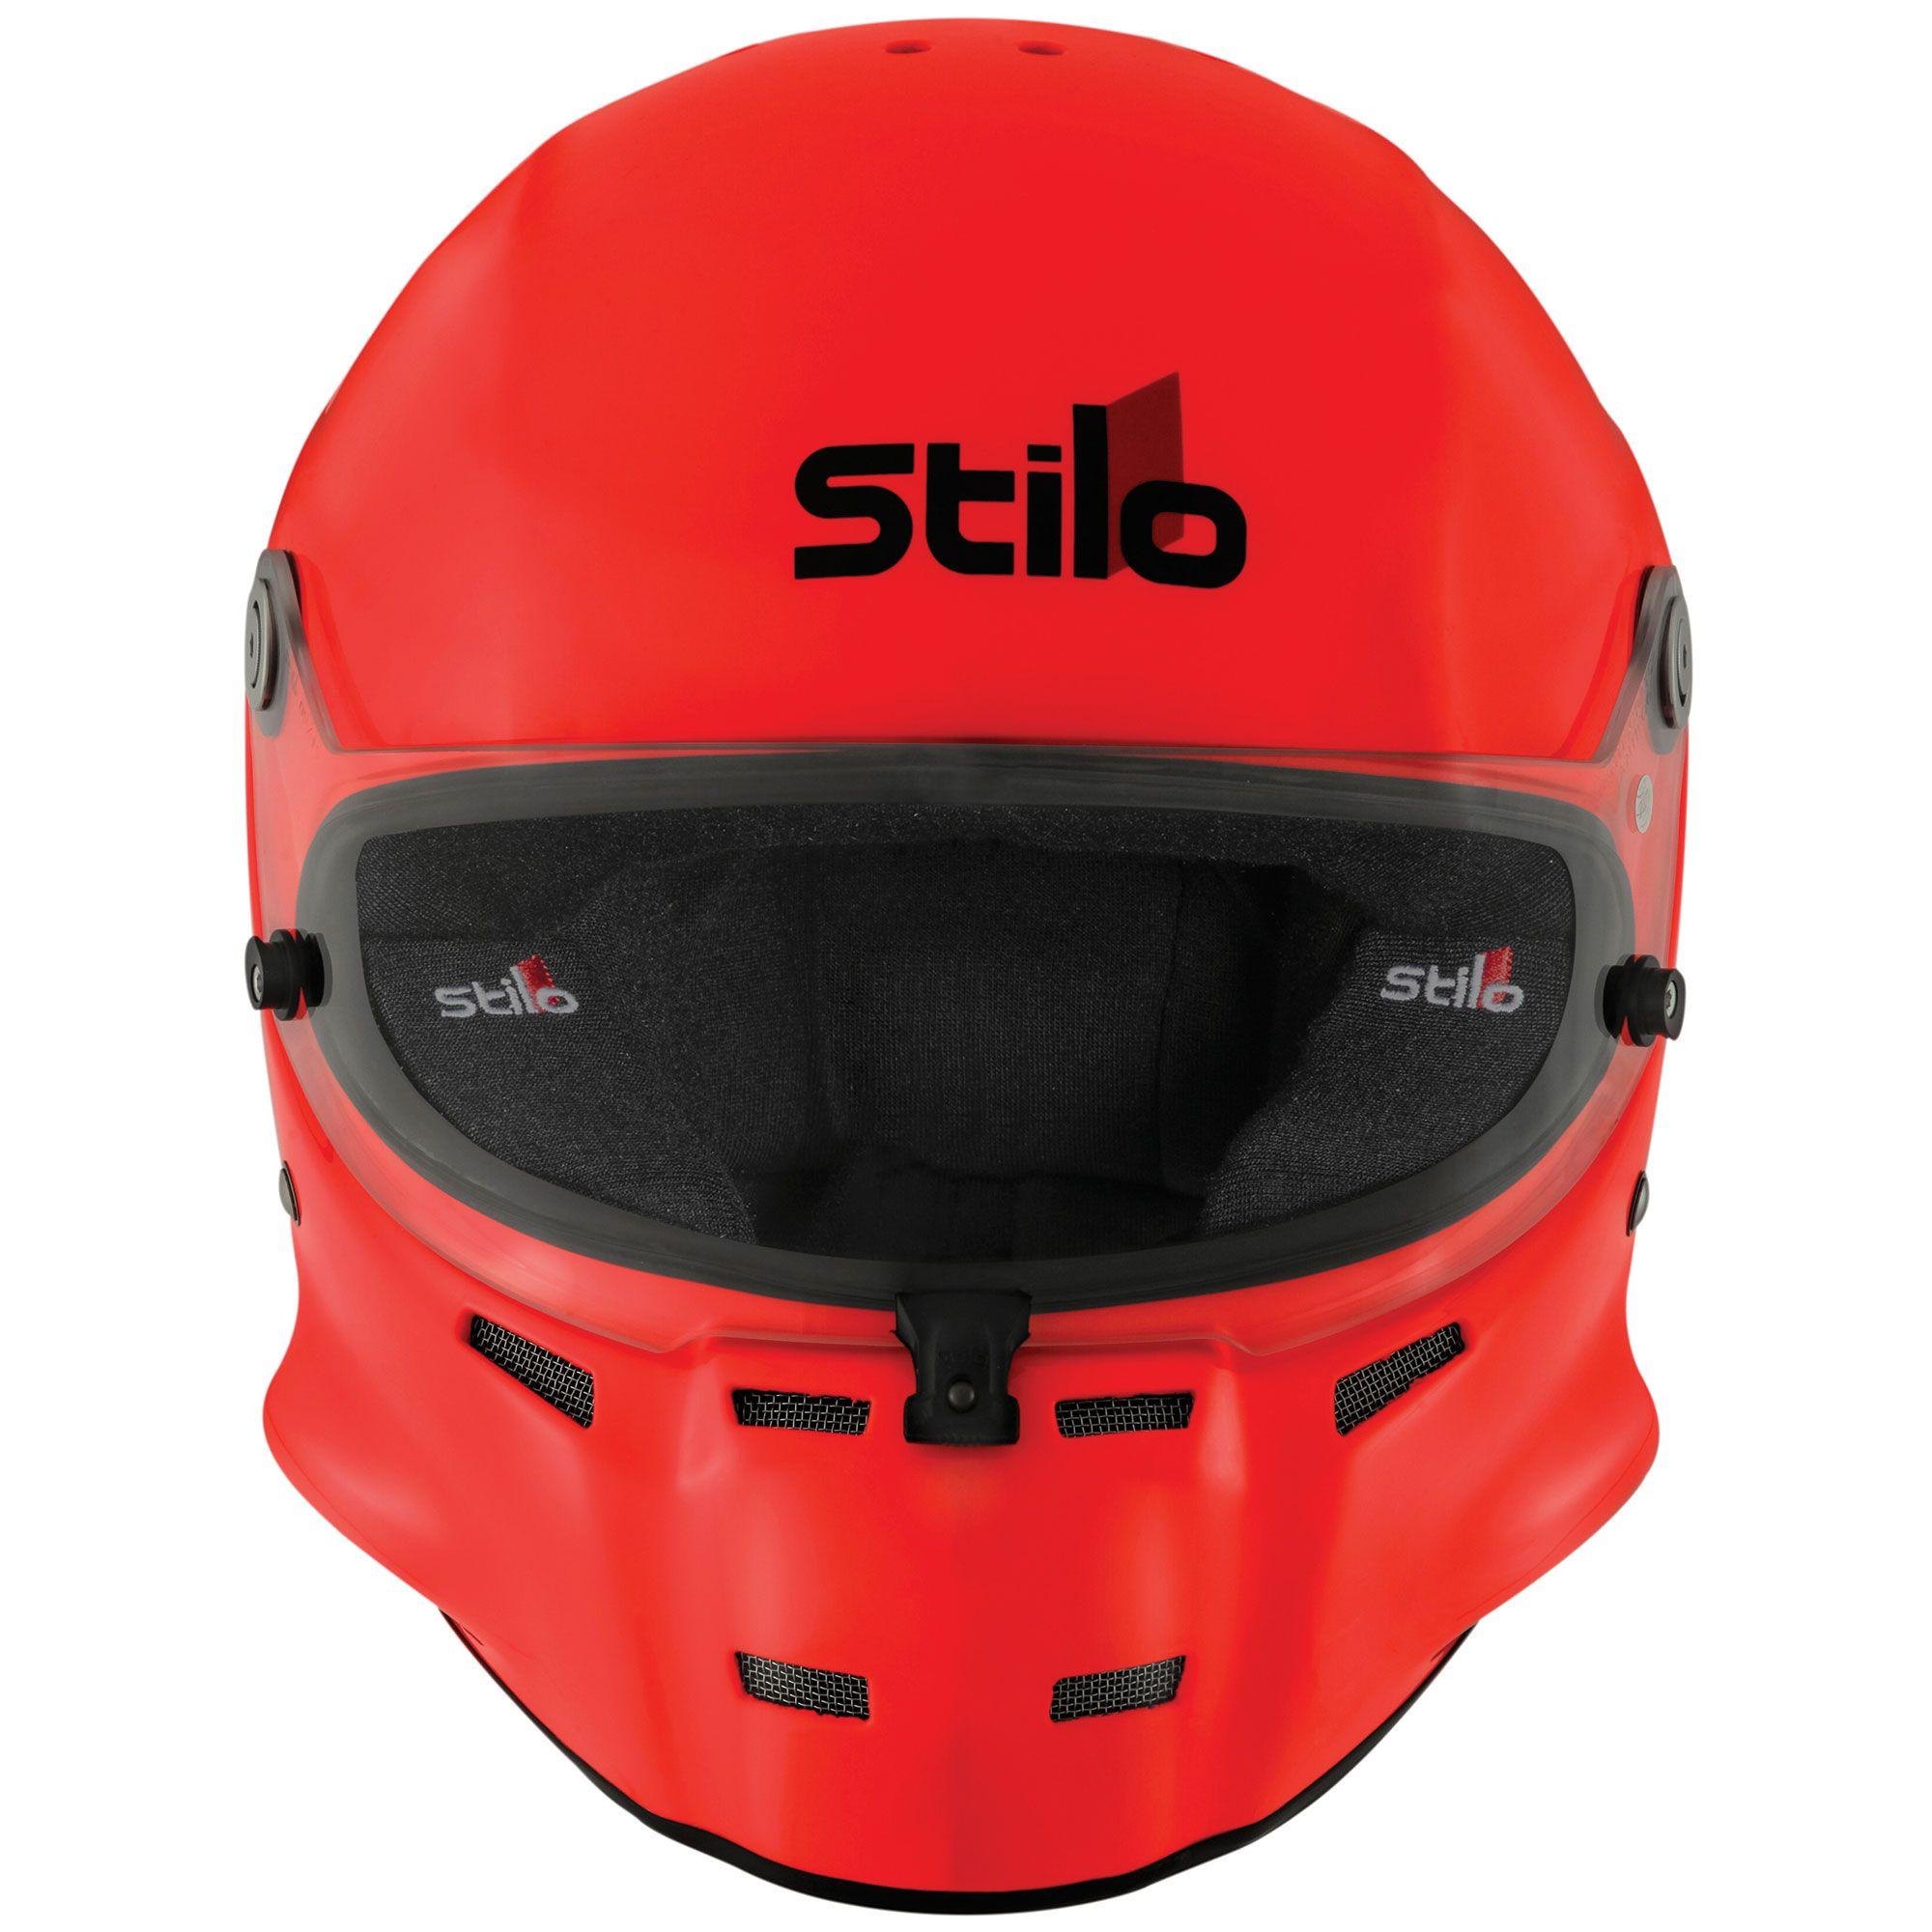 69feeeca Stilo ST5F Offshore Composite Snell / FIA Race / Rally / Powerboat ...